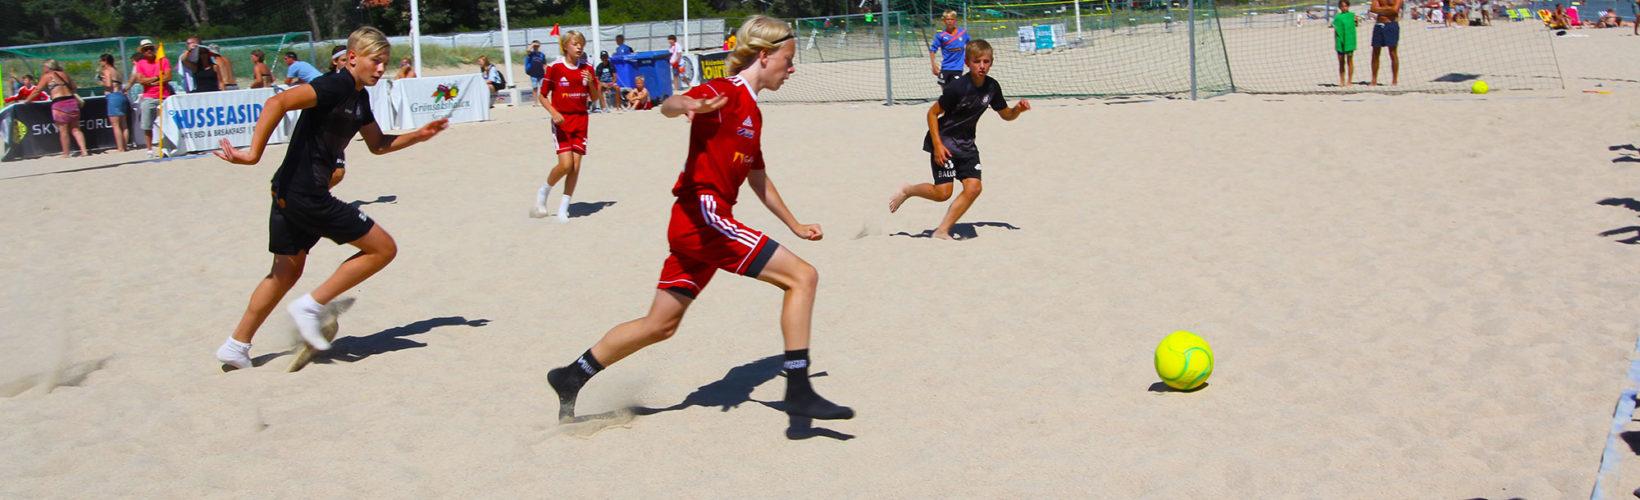 Åhus Beach Fotboll